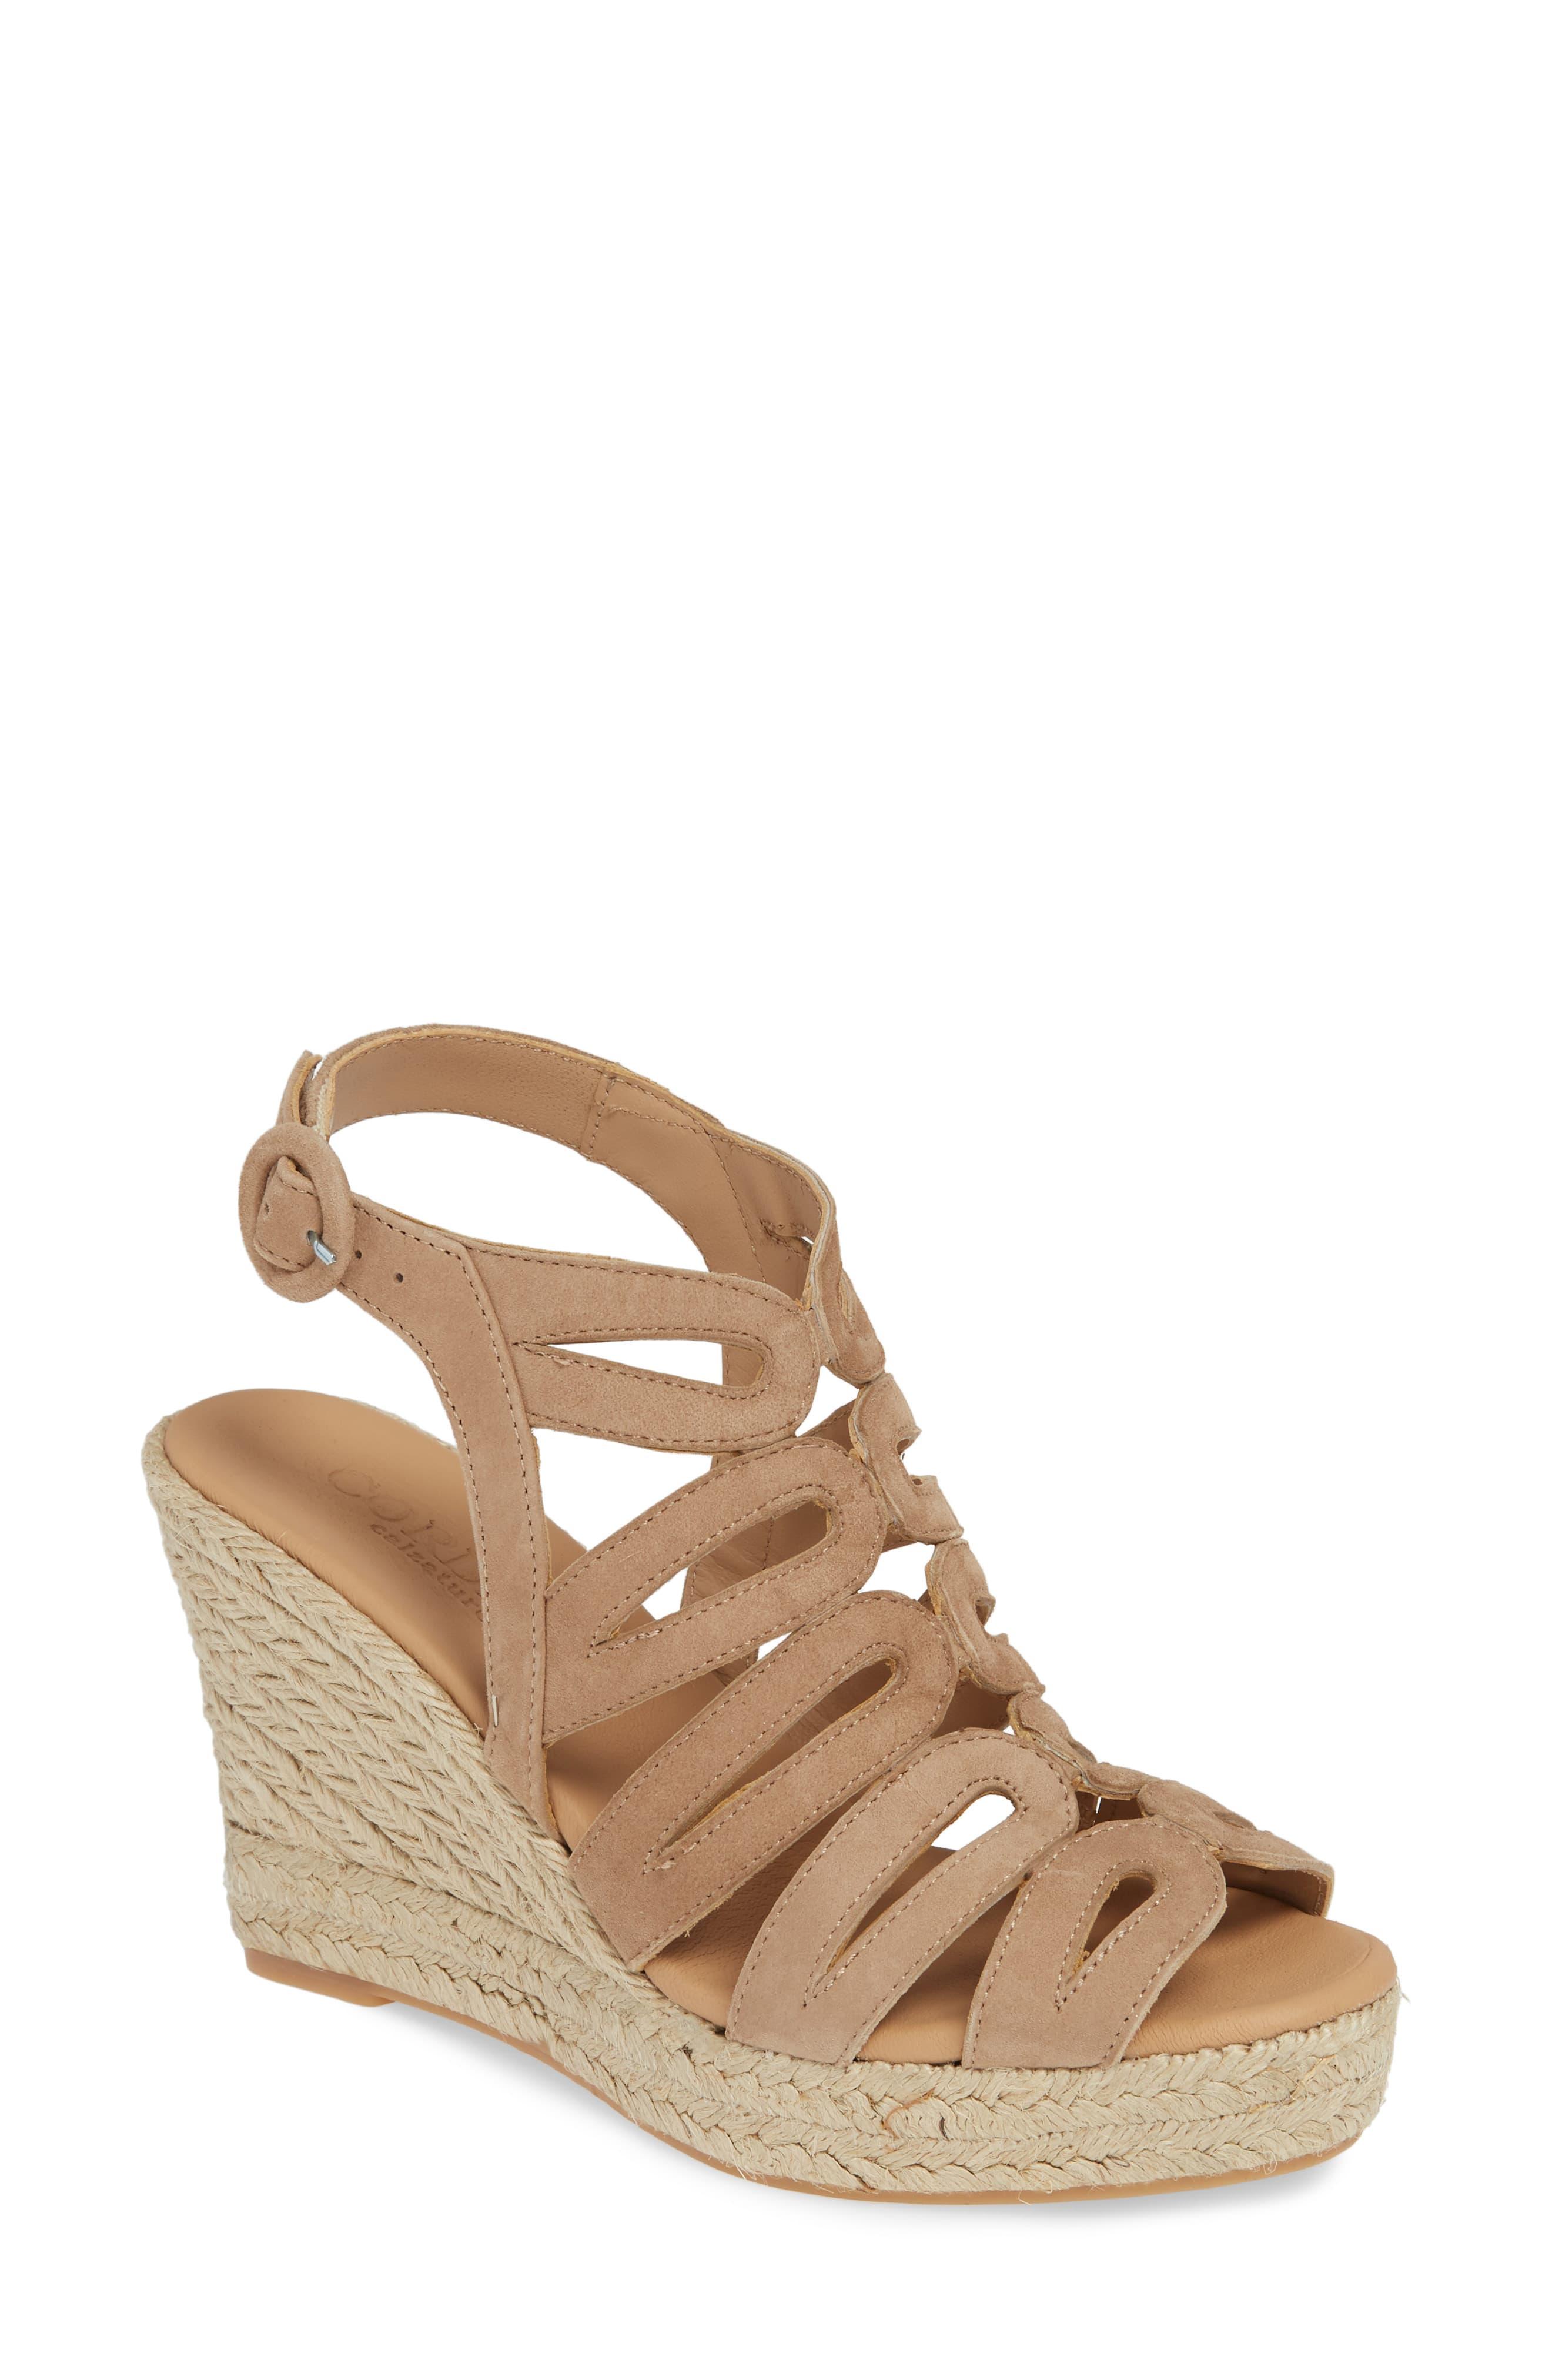 0b88ed375d9 Women's Cordani Ezra Espadrille Wedge Sandal, Size 5.5US / 36EU ...